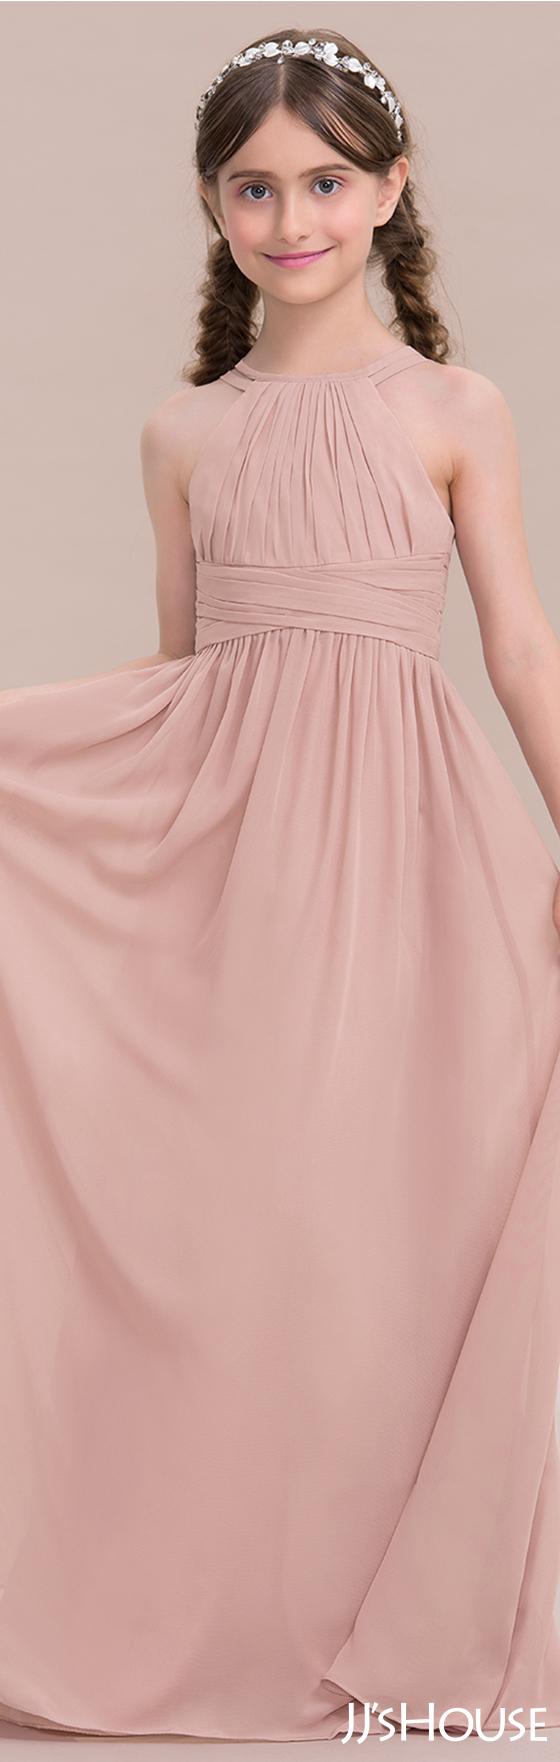 JJsHouse #Junior #Bridesmaid   moda infaltil   Pinterest   Vestido ...